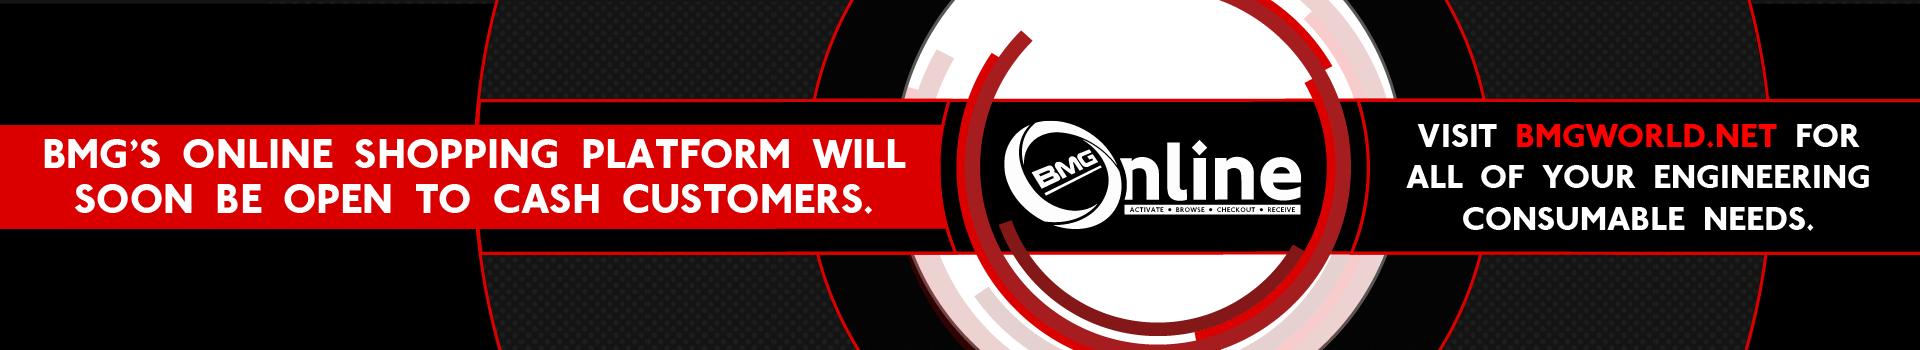 IB BMG June 2021